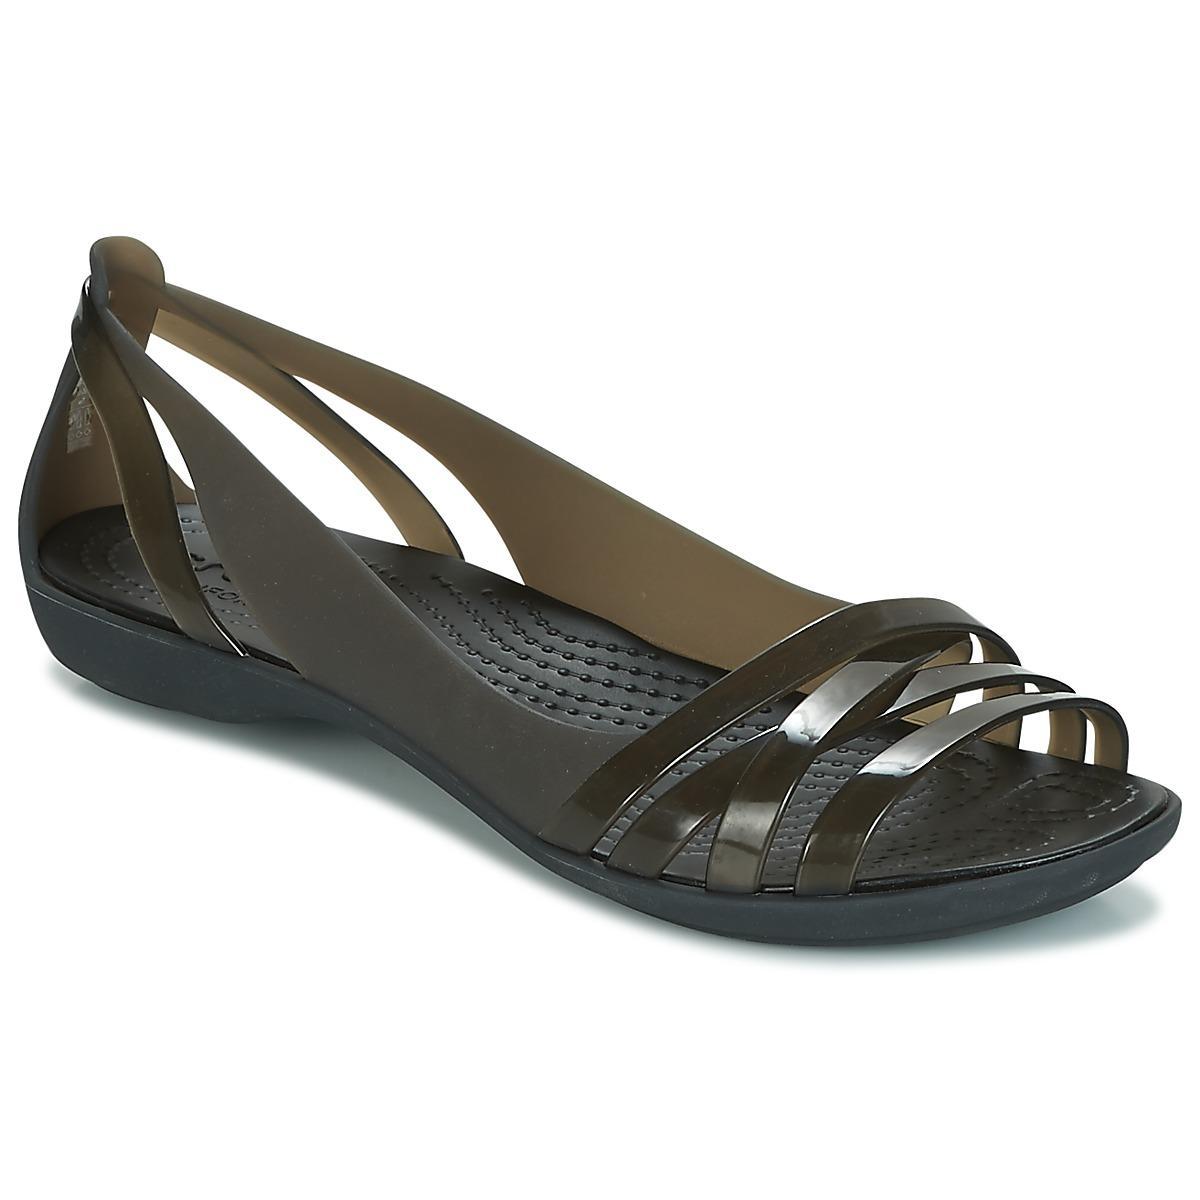 ba31caee9 Crocs™ Isabella Huarache 2 Flat W Sandals in Black - Save 18% - Lyst